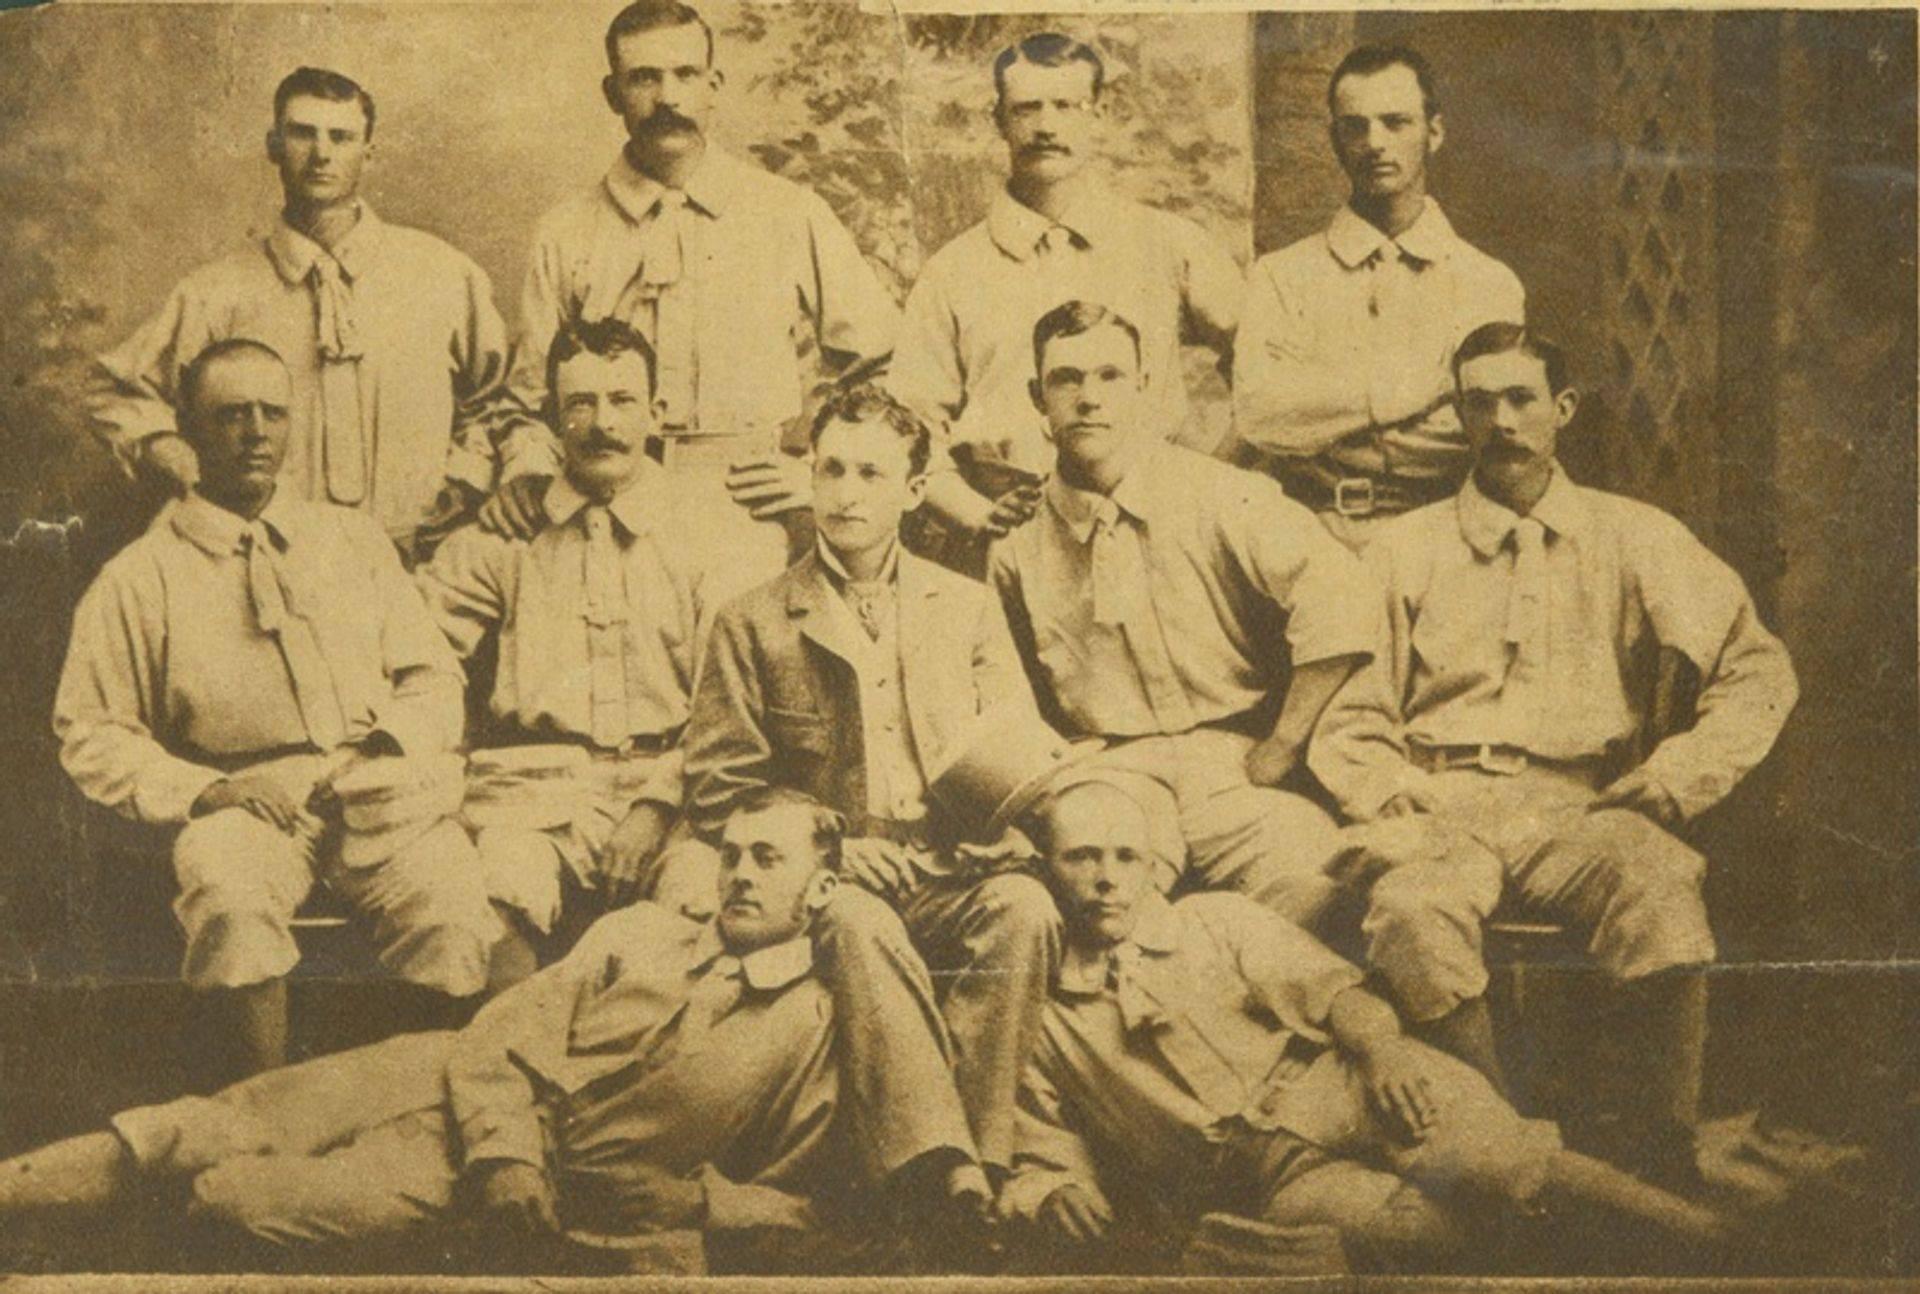 The Cleveland Blues Base Ball Club - clevelandcom